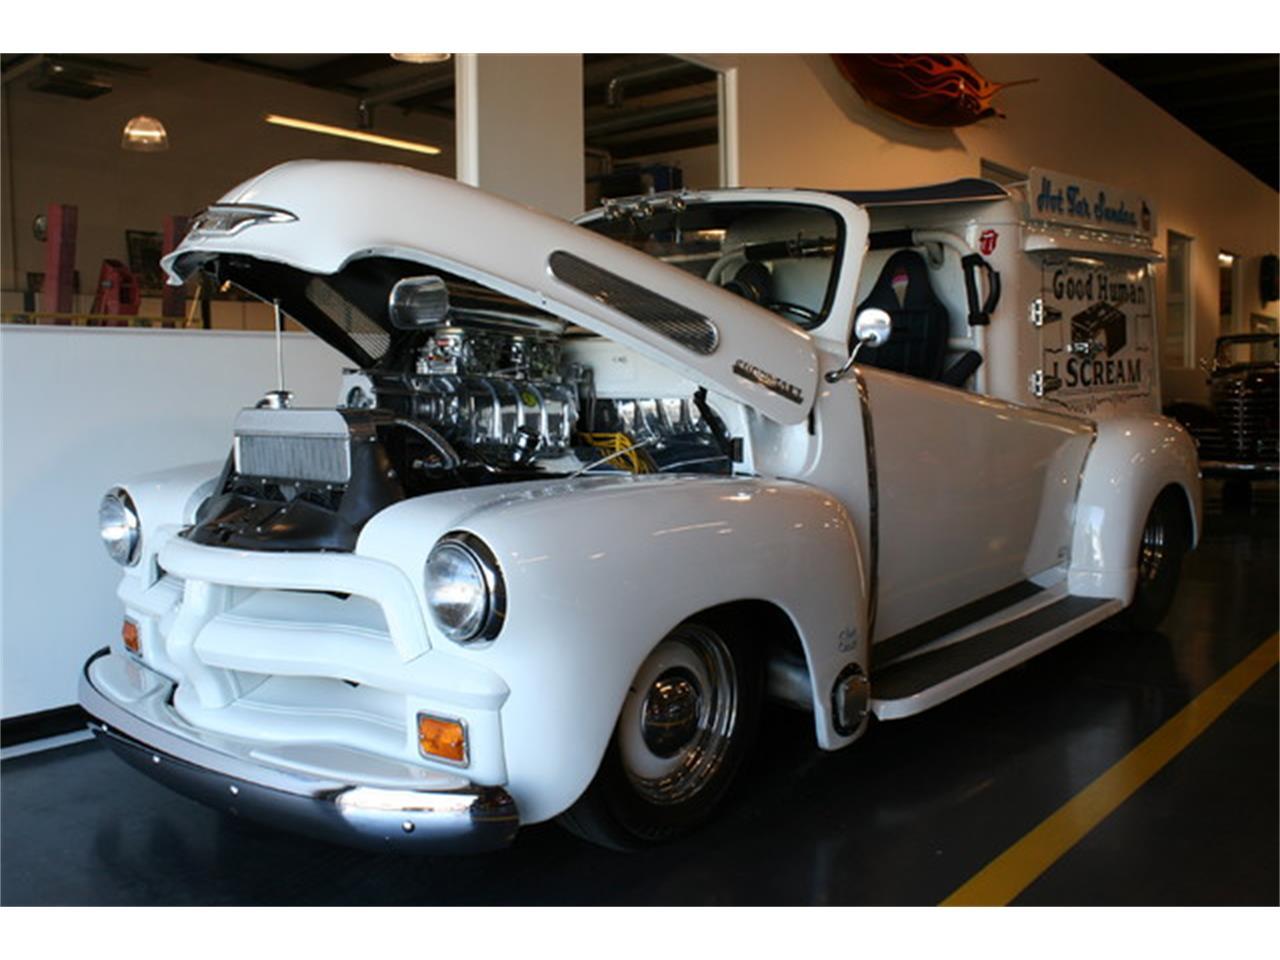 Ice Cream Trucks For Sale >> For Sale 1955 Chevrolet Ice Cream Truck In Scottsdale Arizona